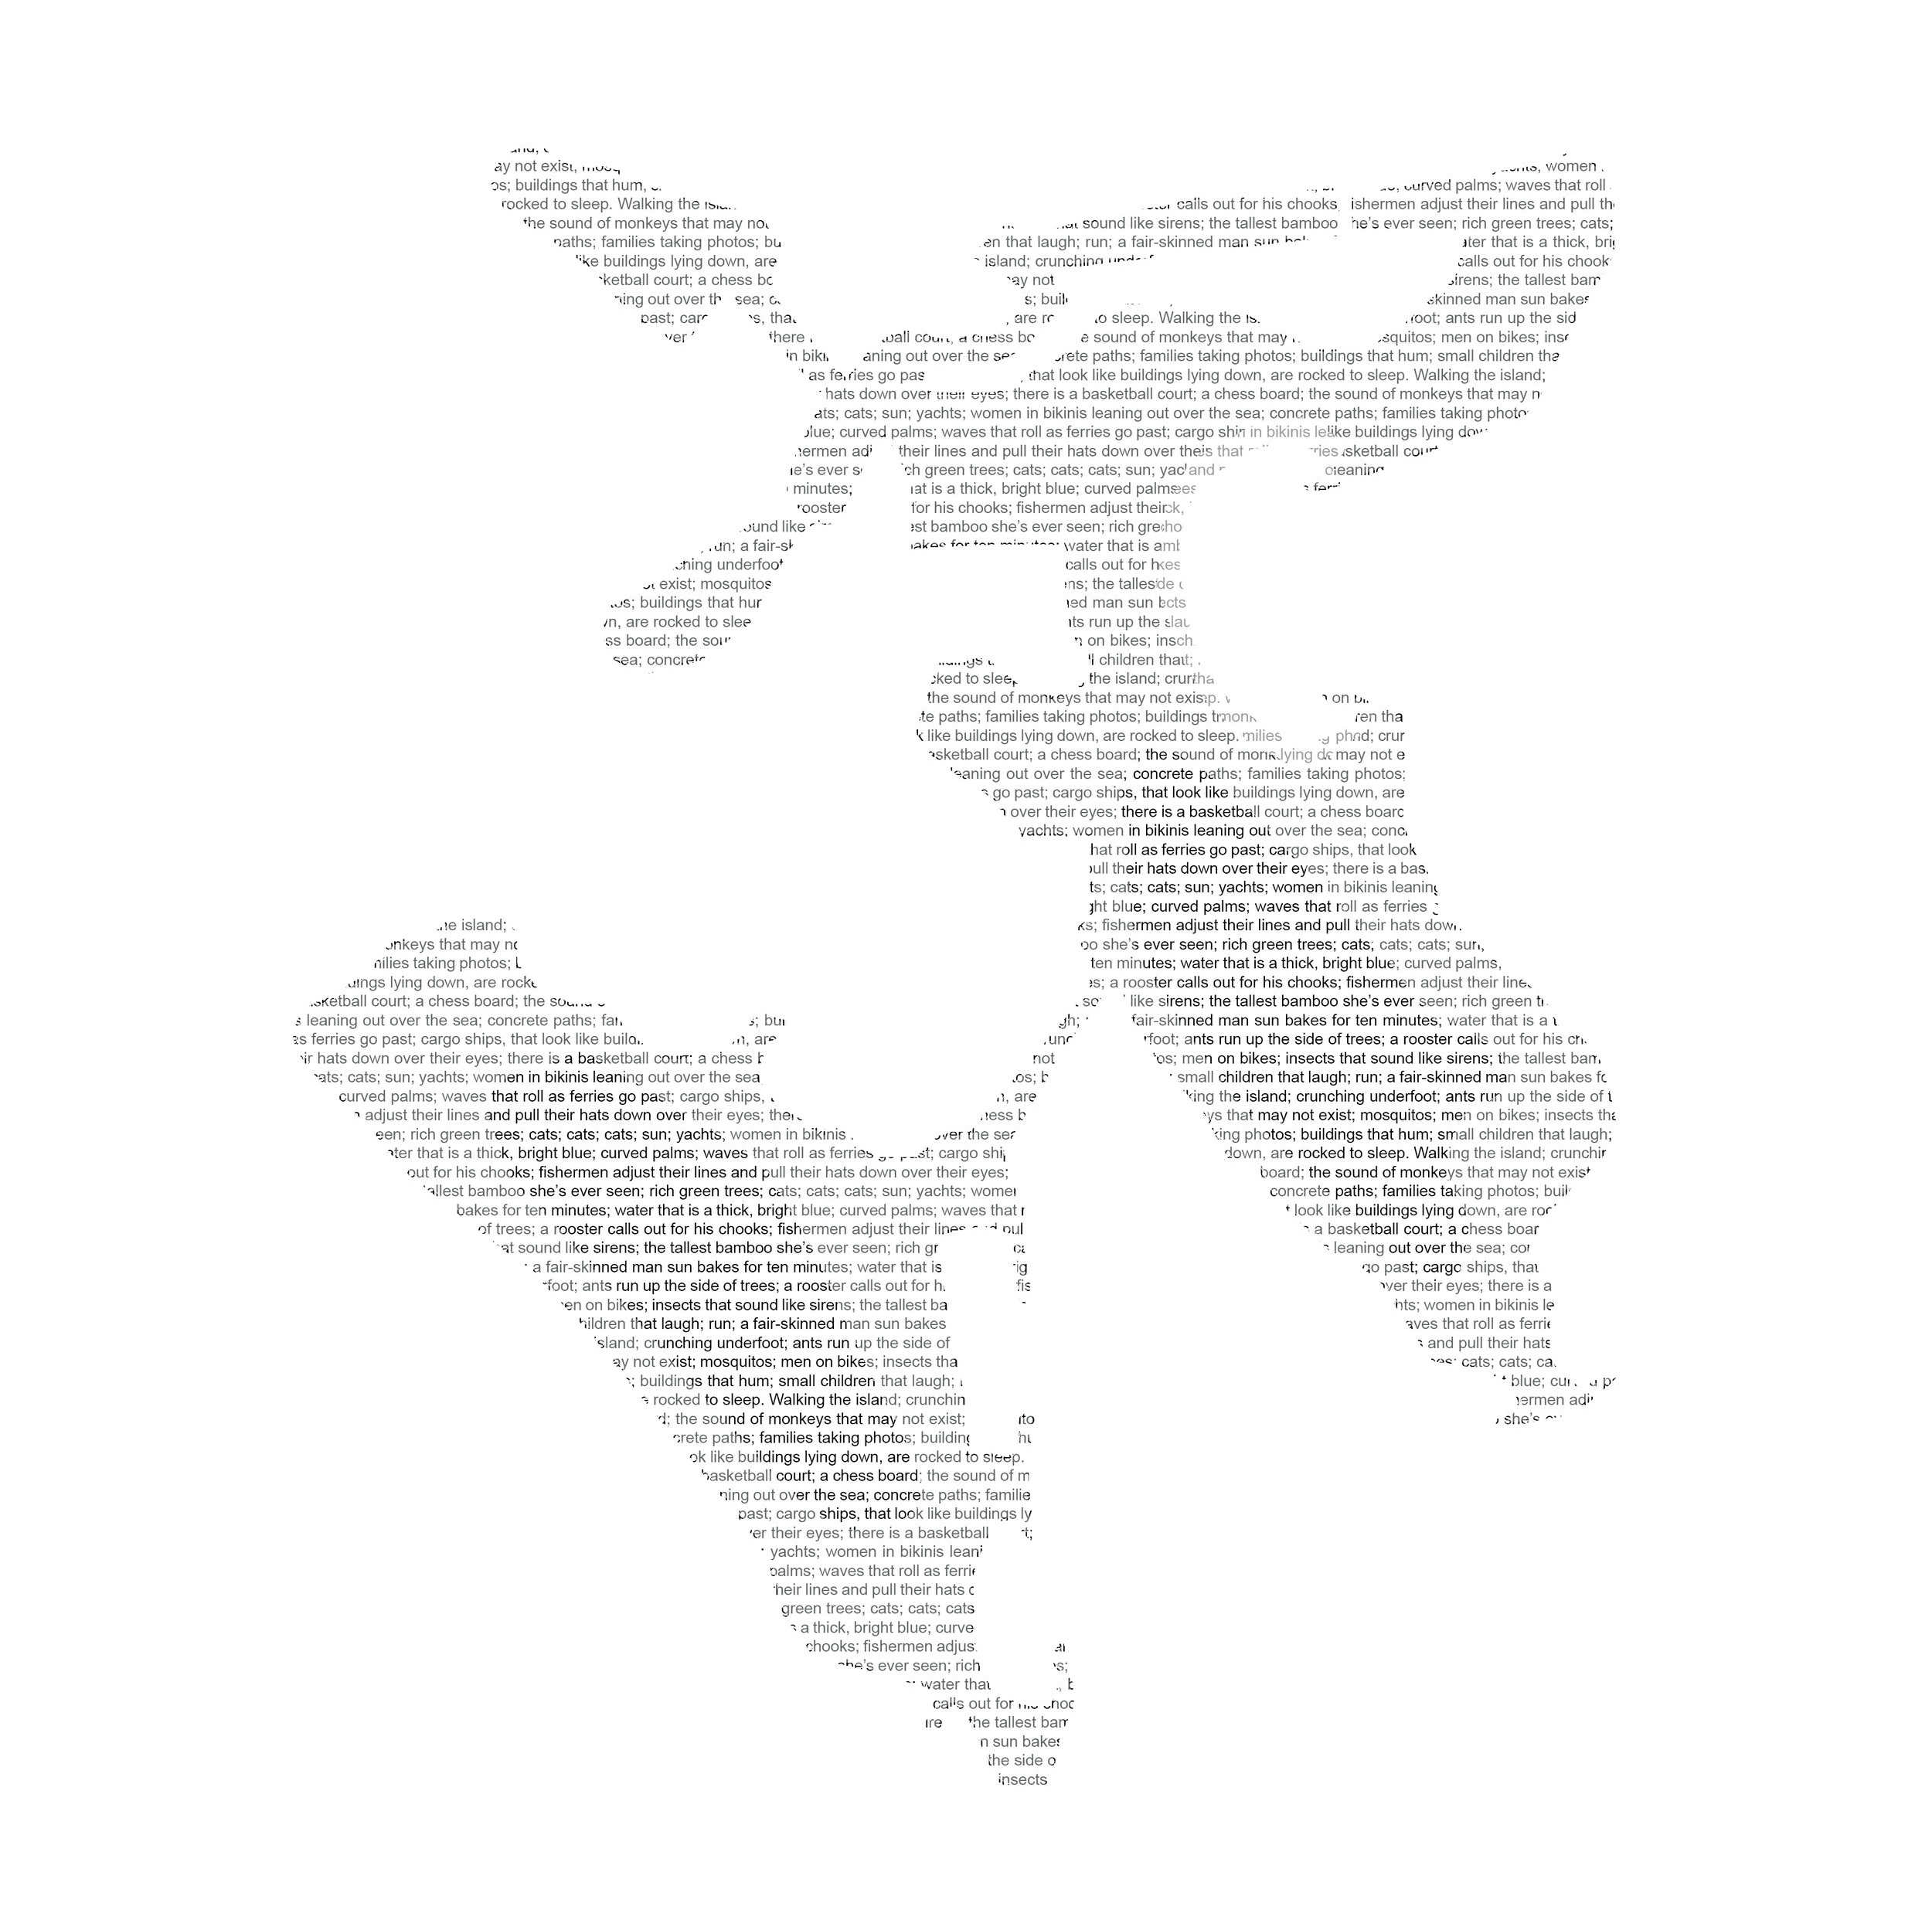 print A3.jpg